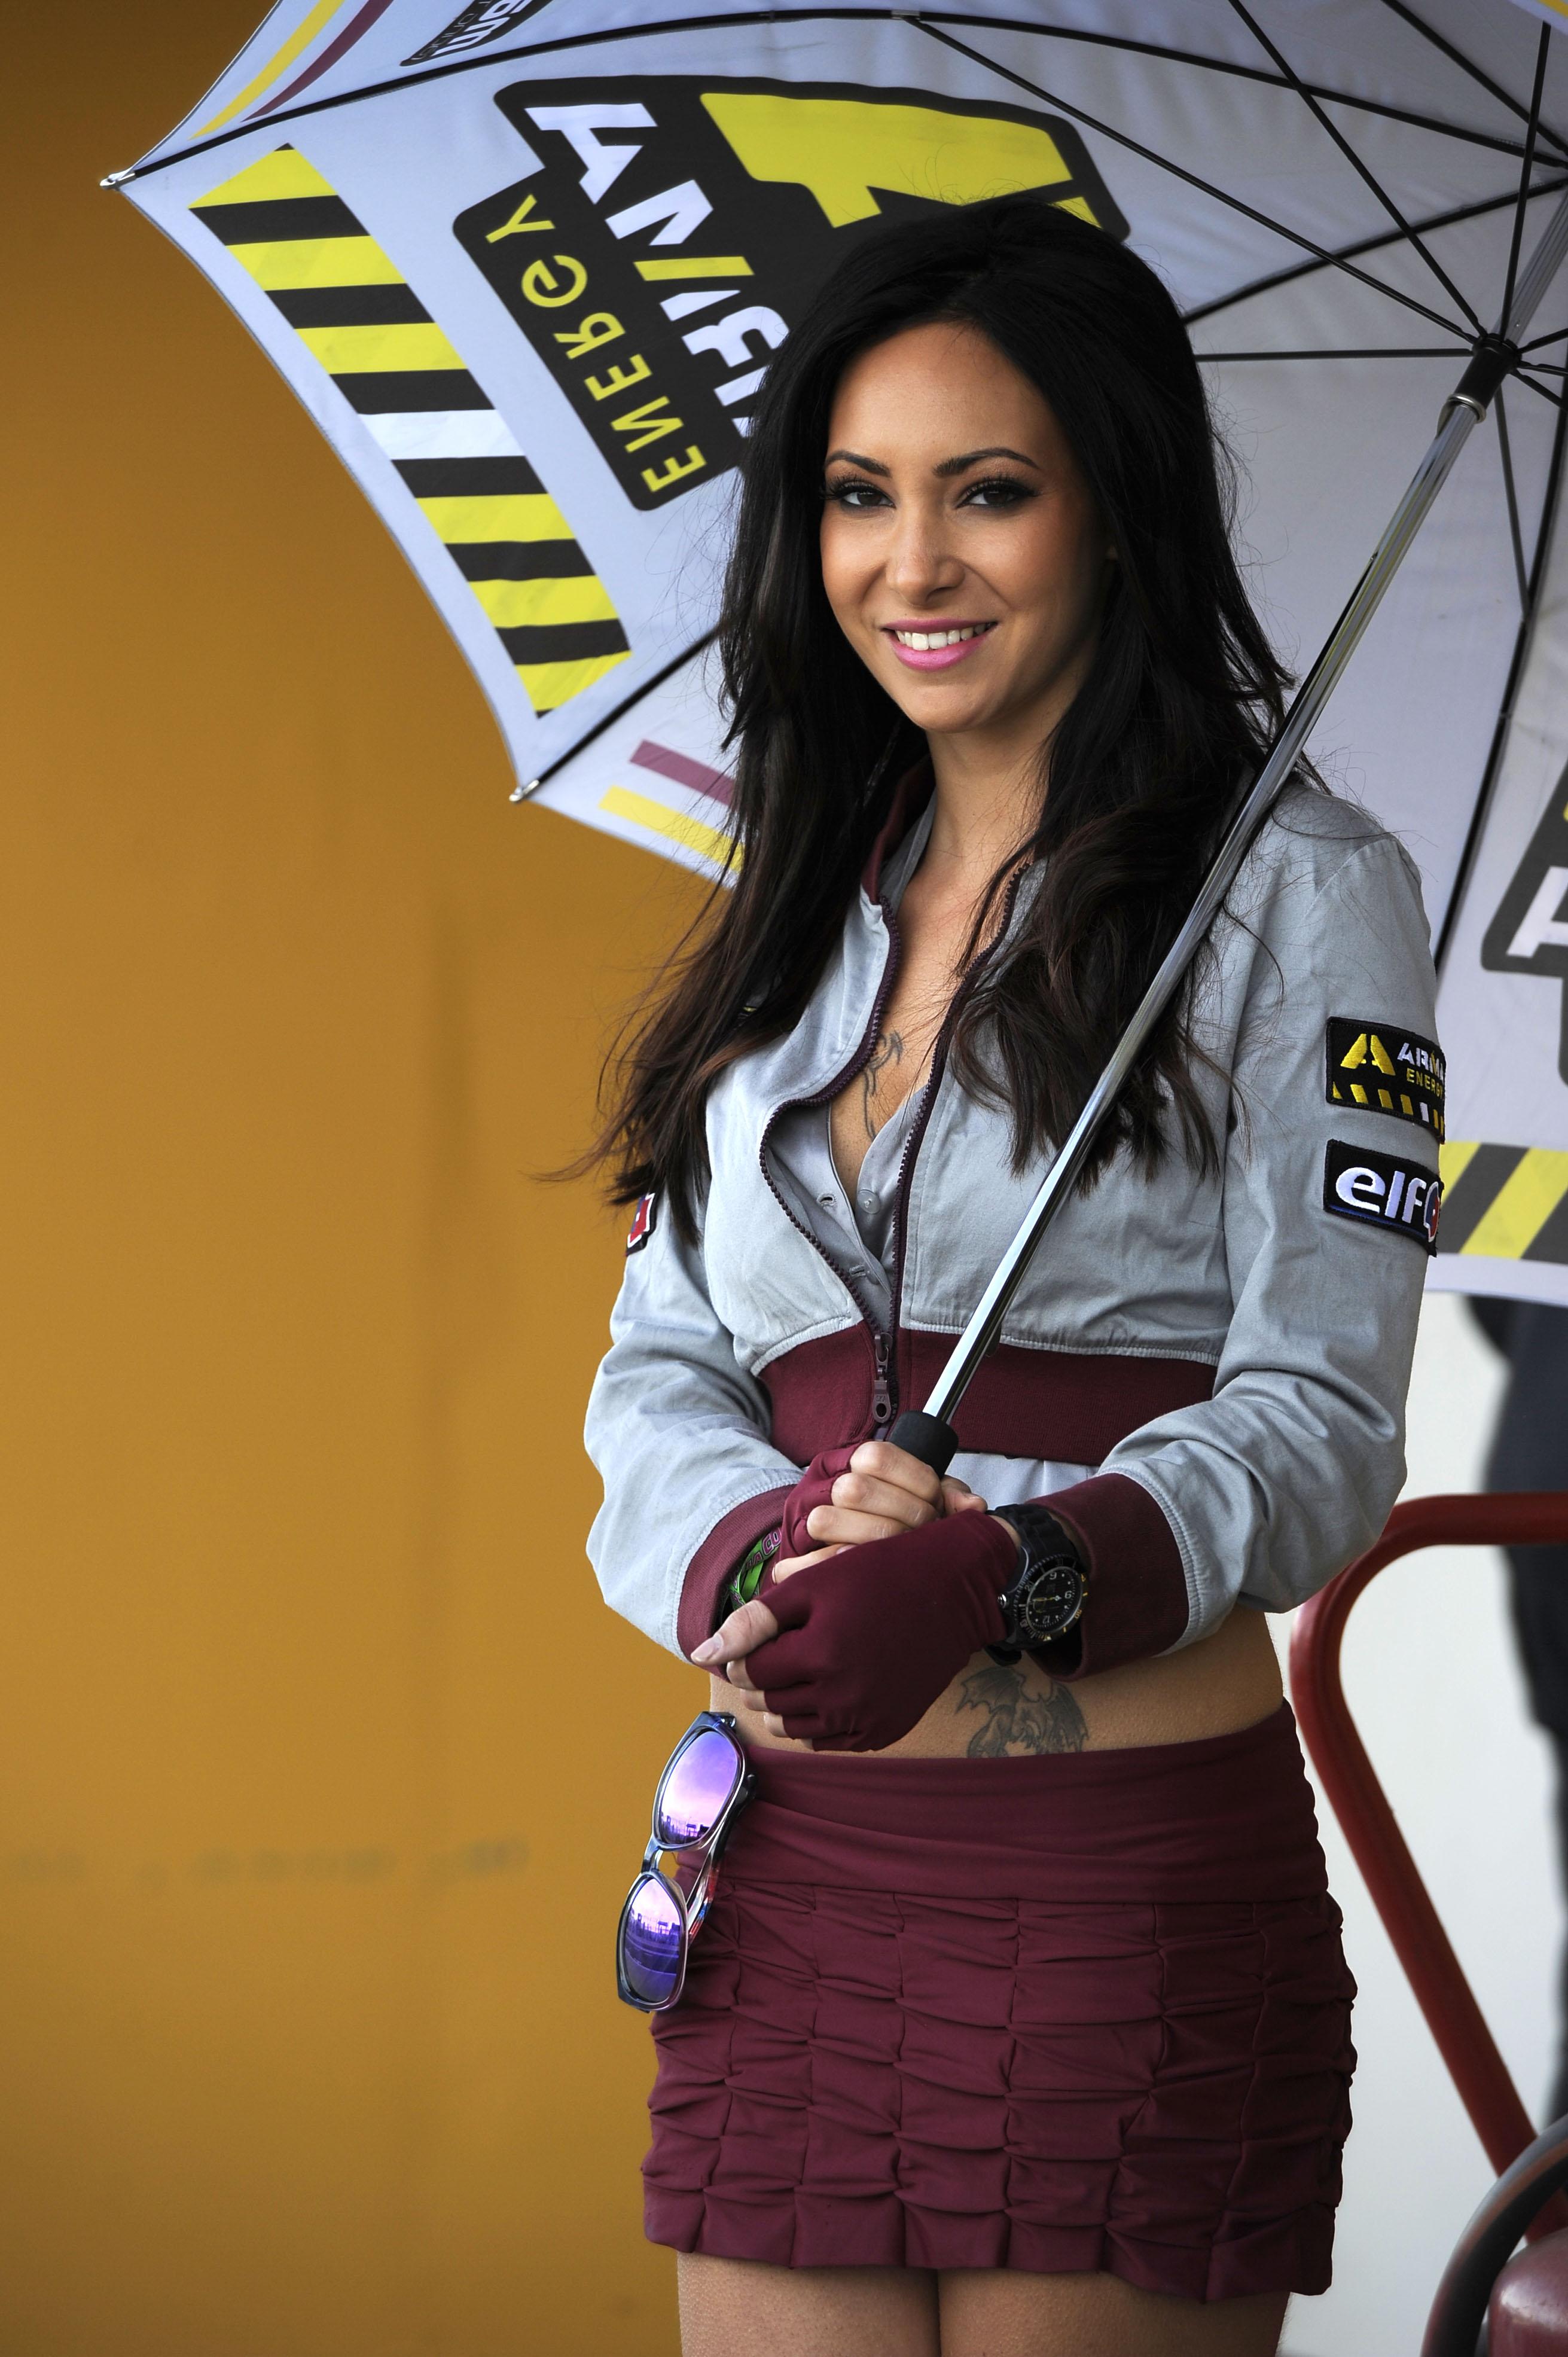 MotoGP Valencia Paddock Girls 2013